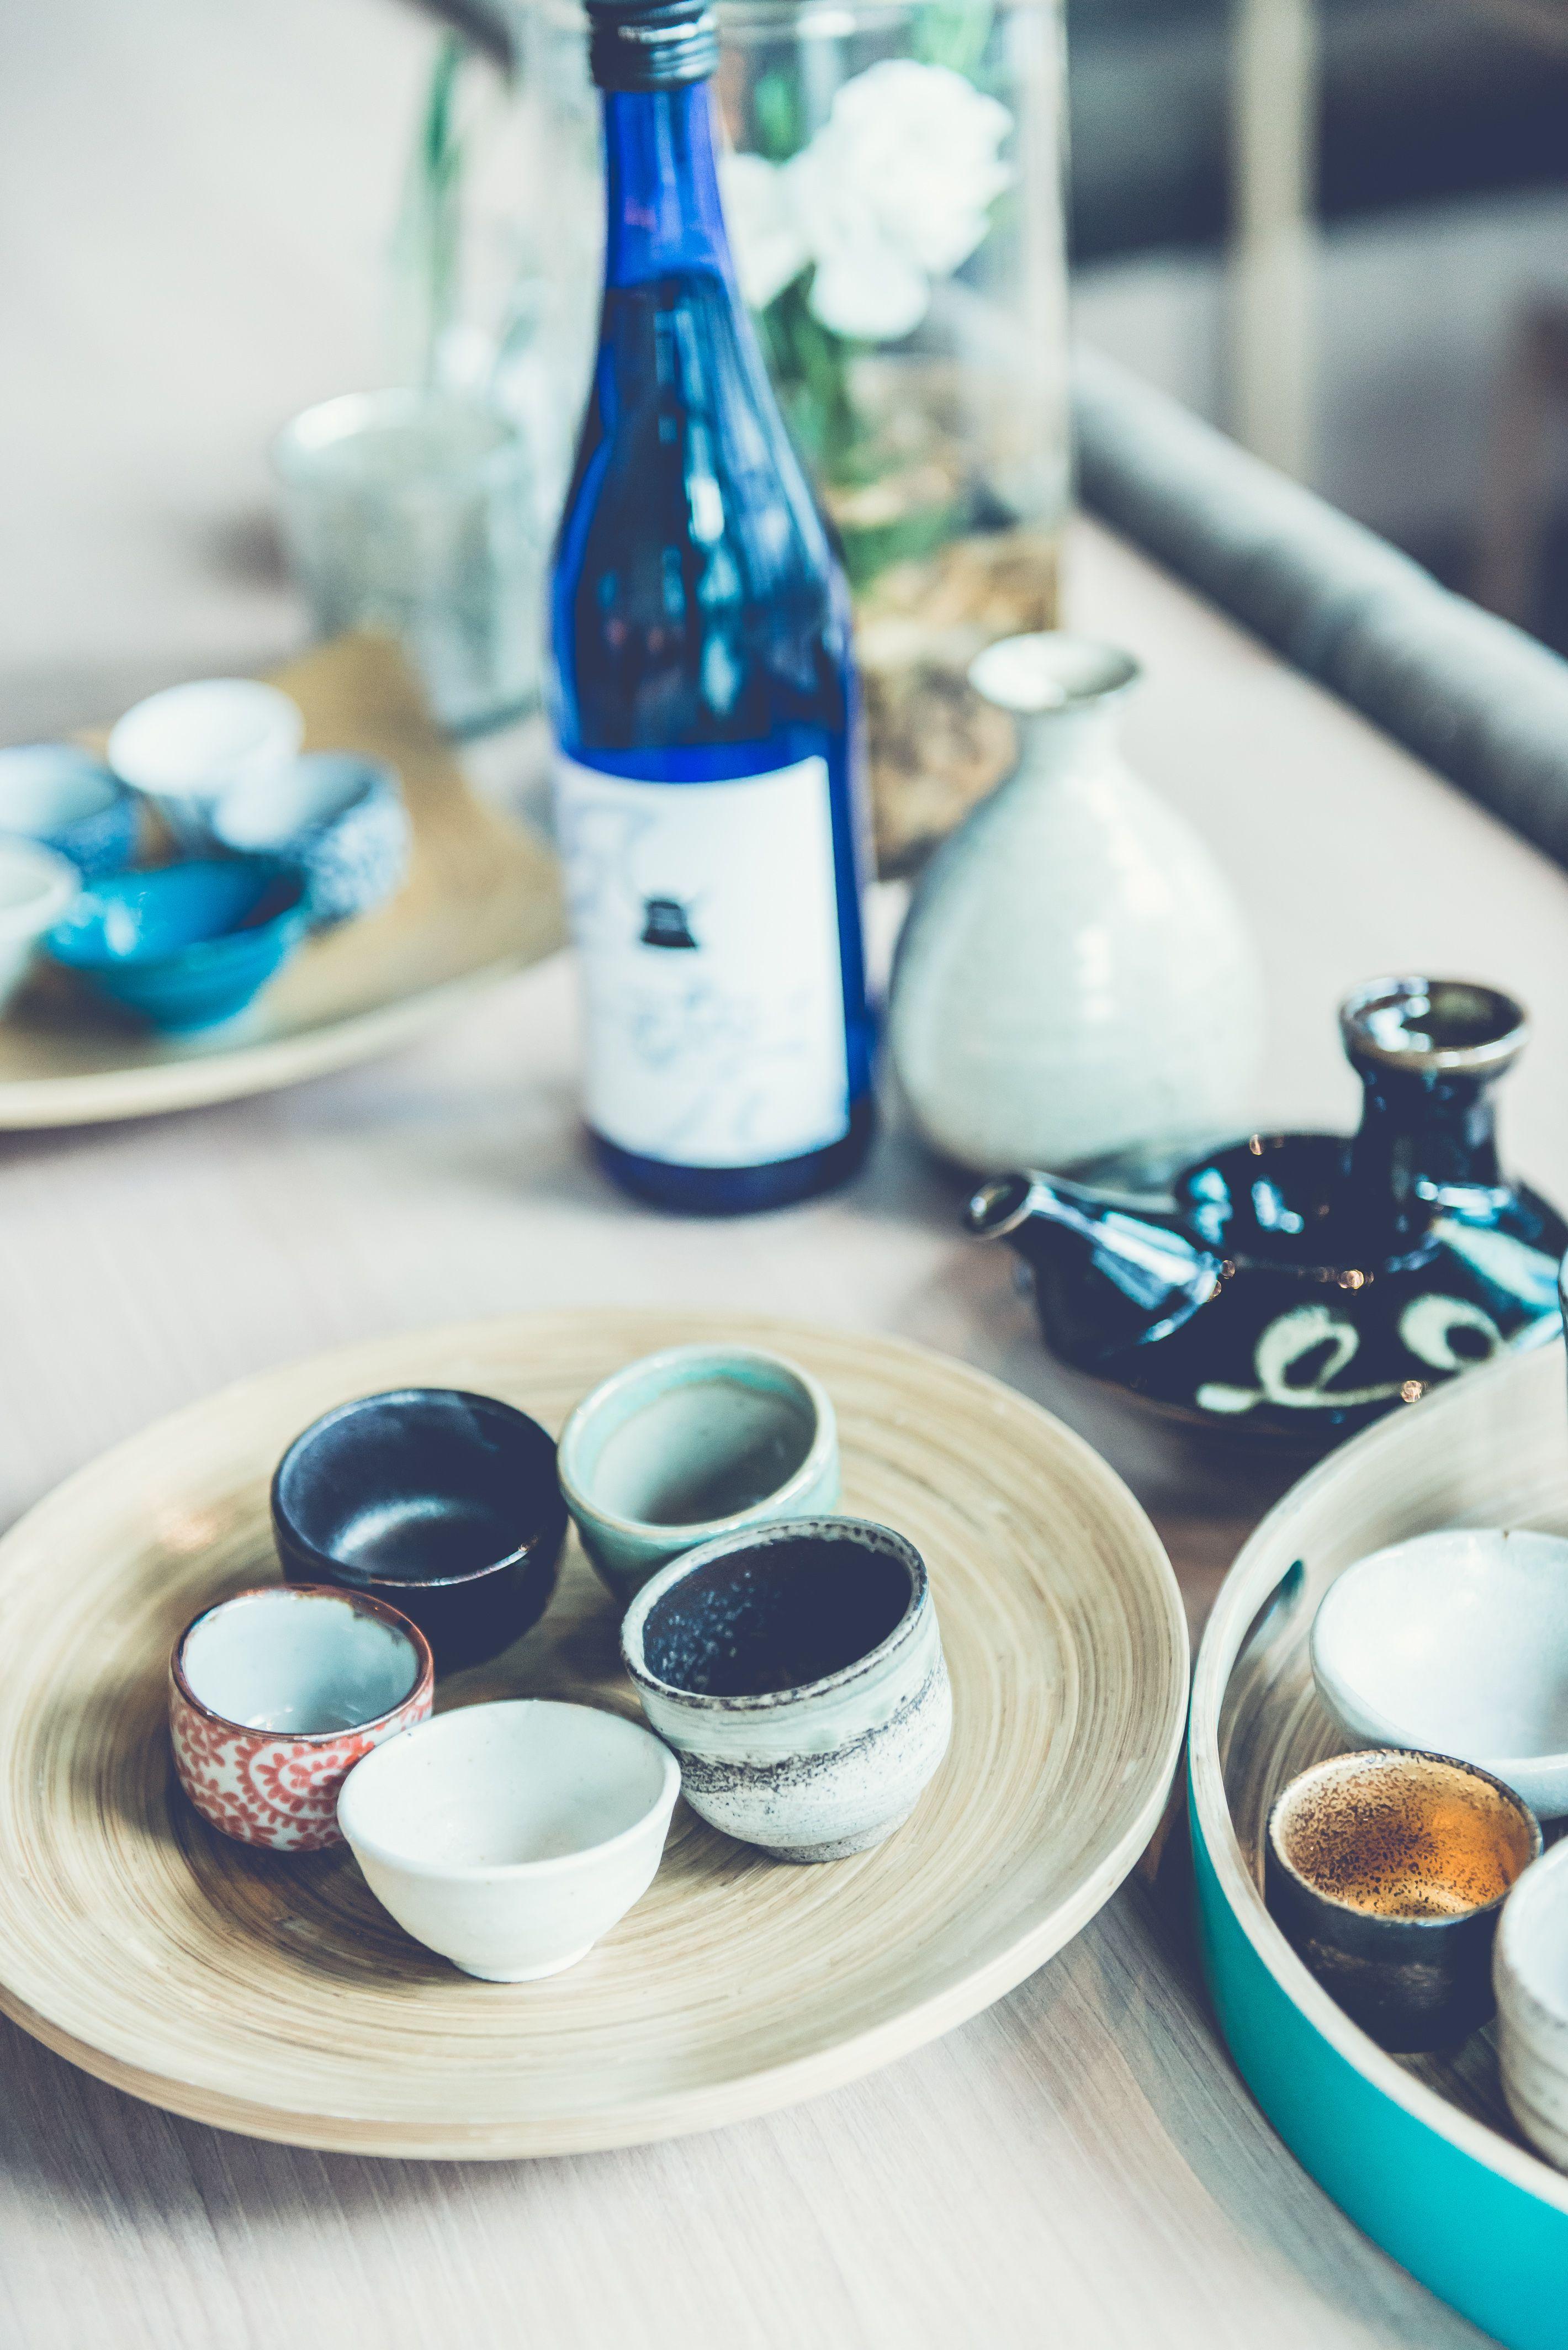 Japanese traditional sake glasses, together with our exclusive sake Kurokabuto  #tburu #singapore #japanese #restaurant #sake #foodporn #drinks #alcohol #traditional